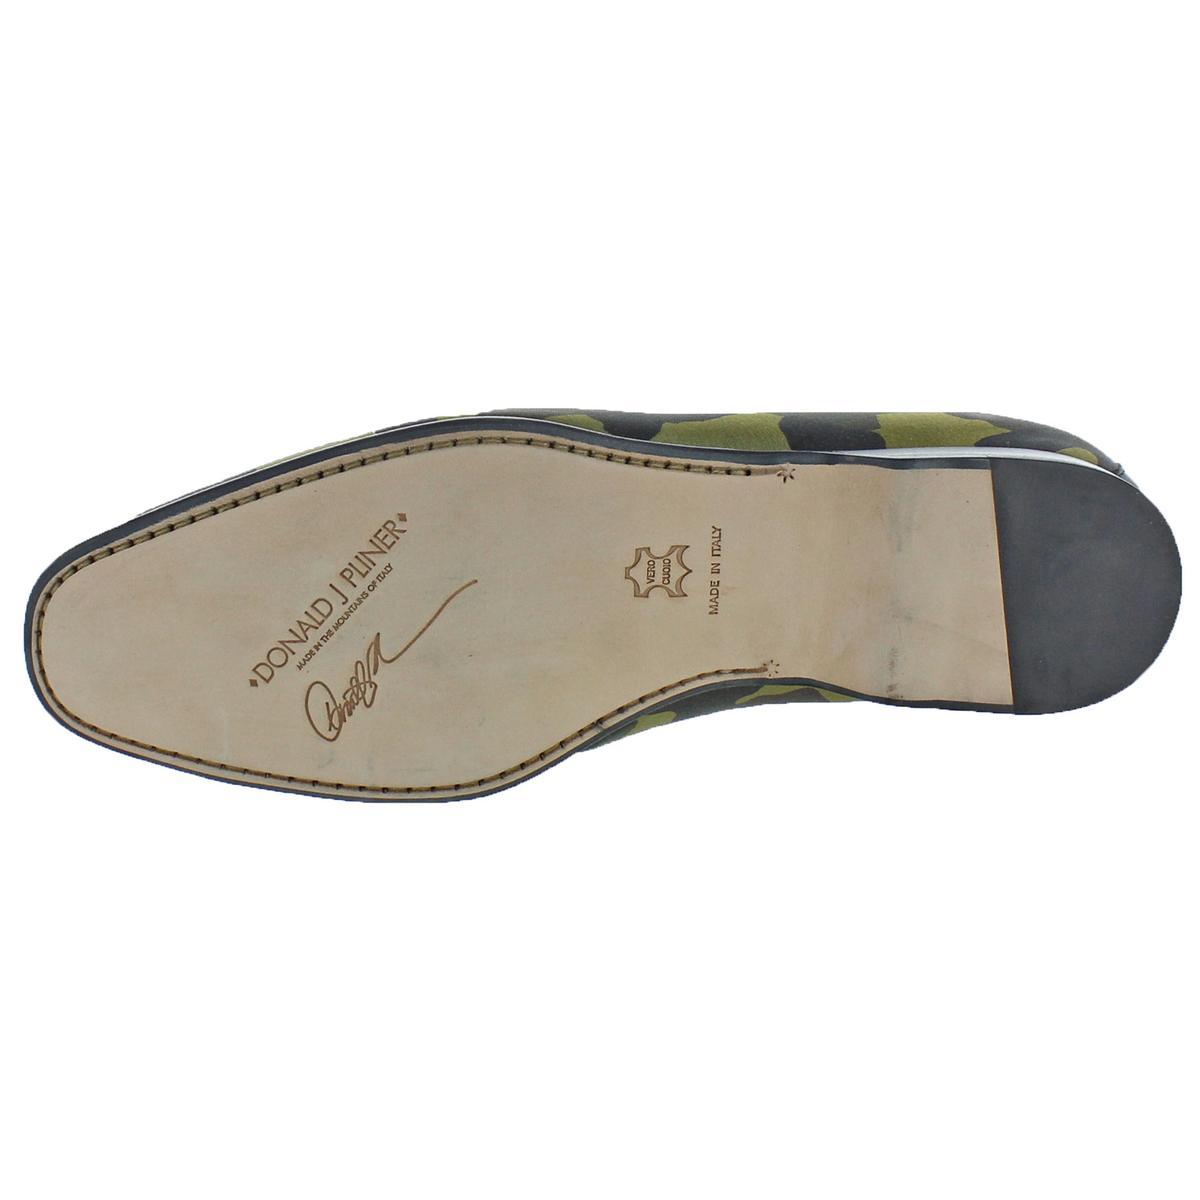 Donald J Pliner Mens Pont Man Made Dress Loafers Shoes BHFO 0865